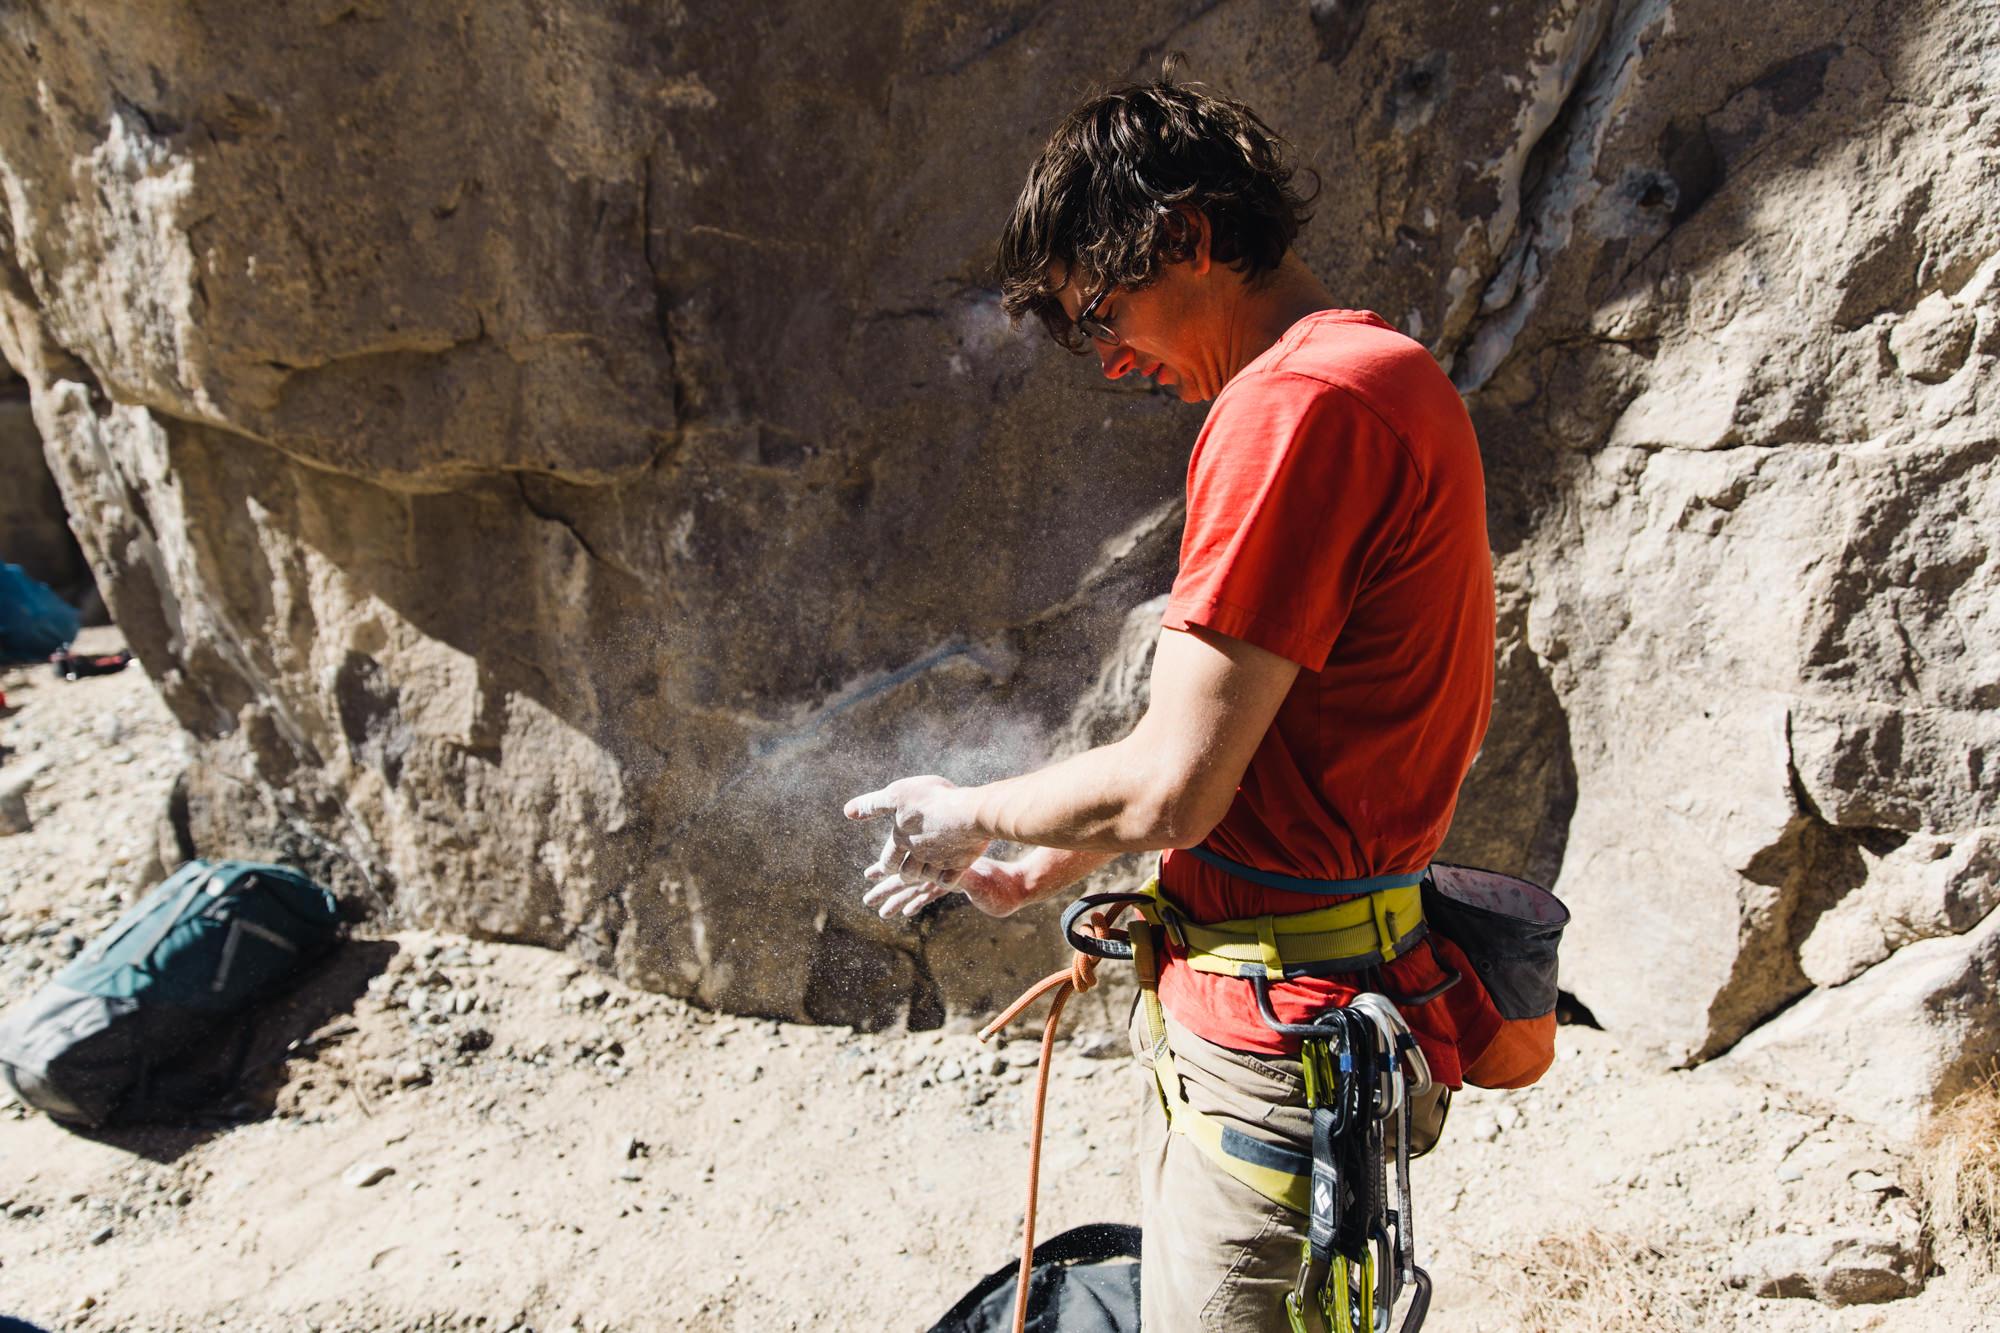 rock-climbing-photography-12.jpg